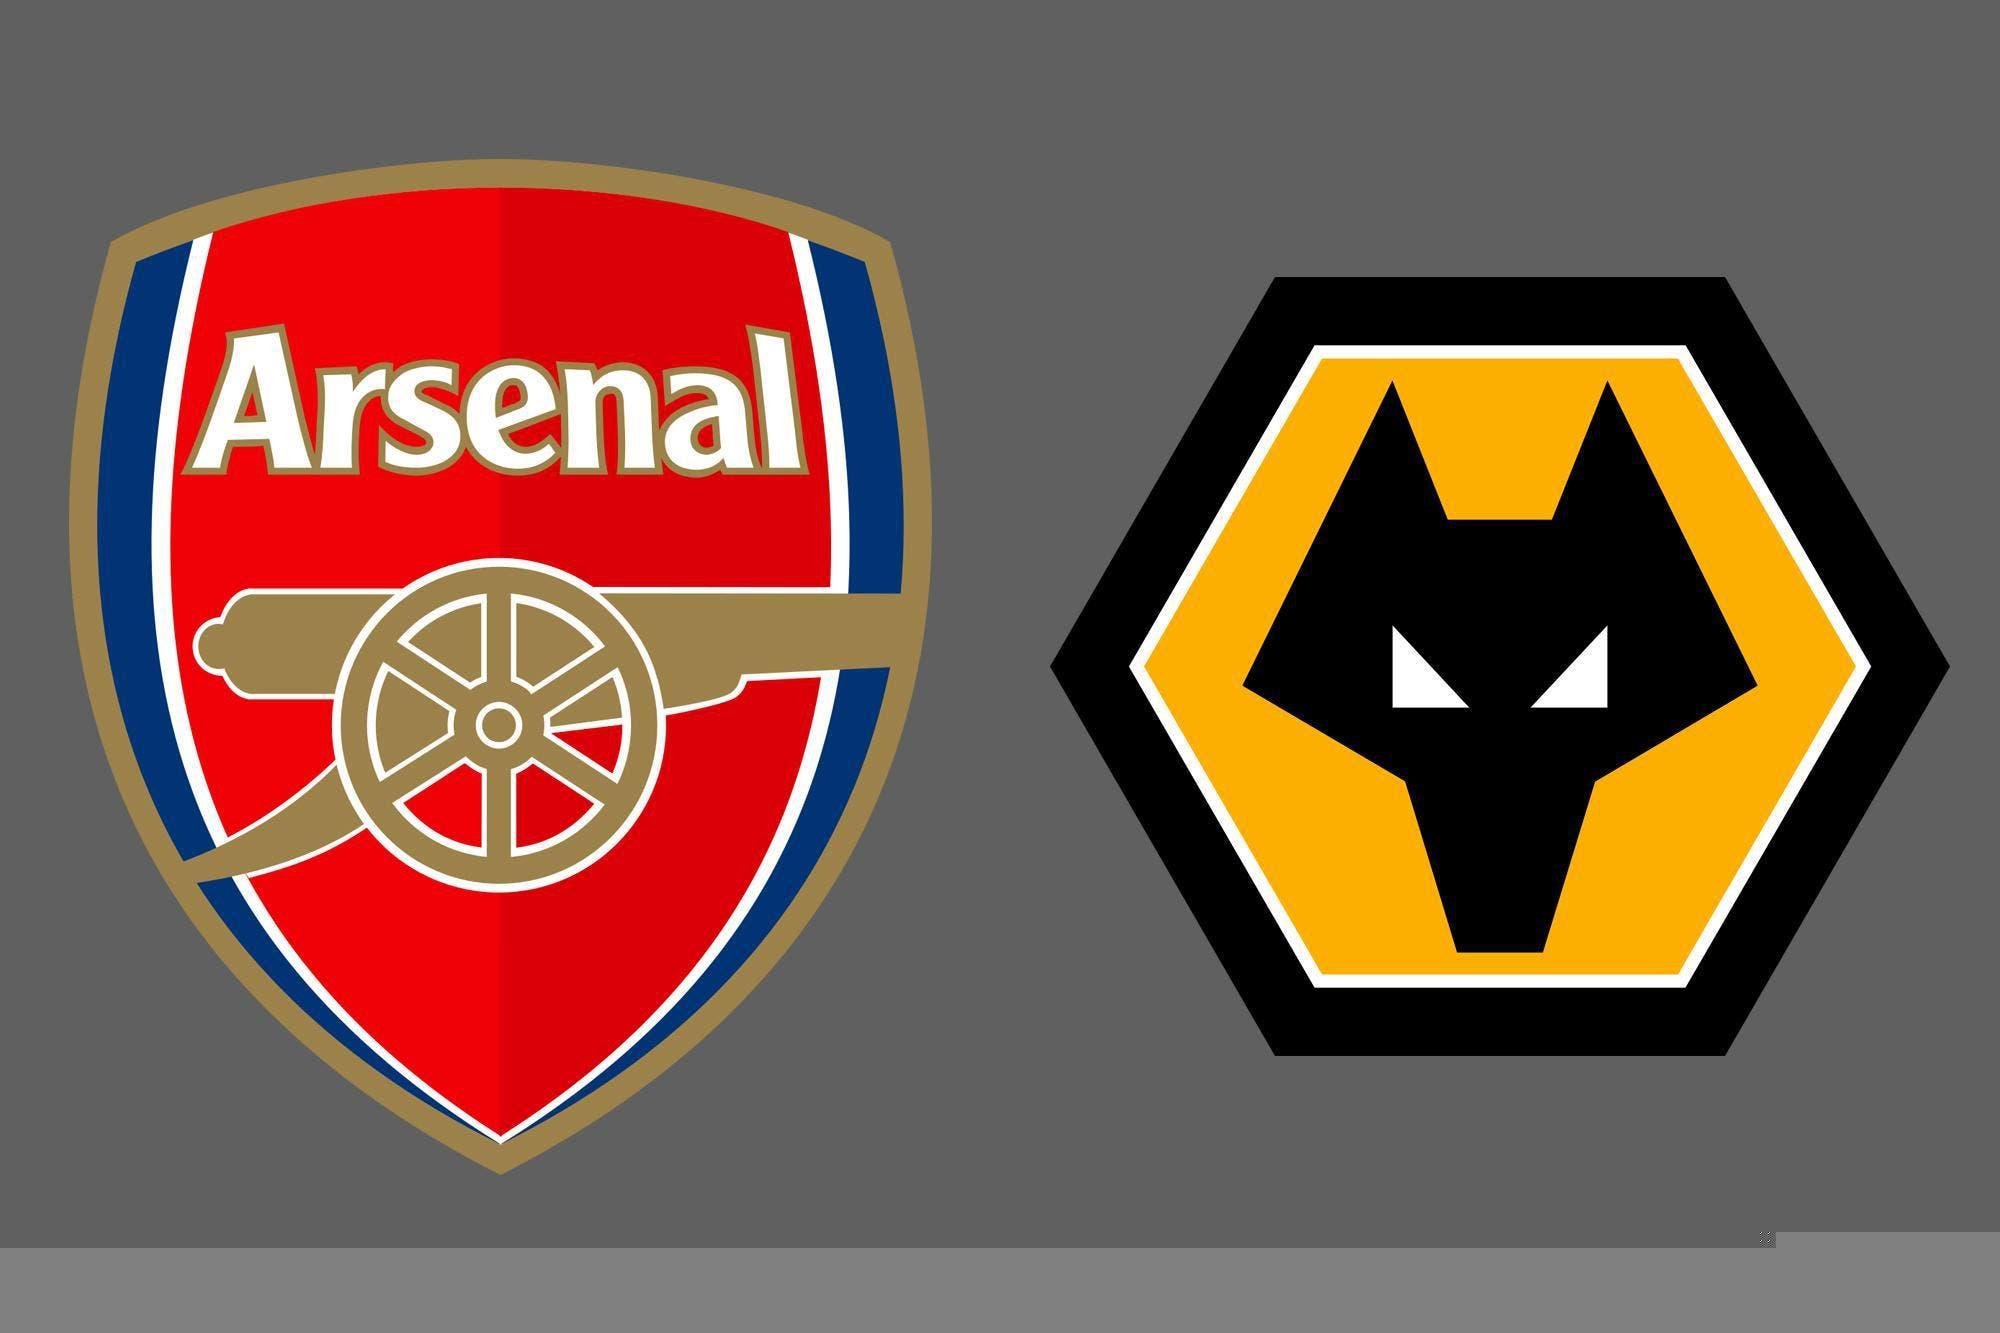 Premier League de Inglaterra: Wolverhampton Wanderers venció por 2-1 a Arsenal como visitante